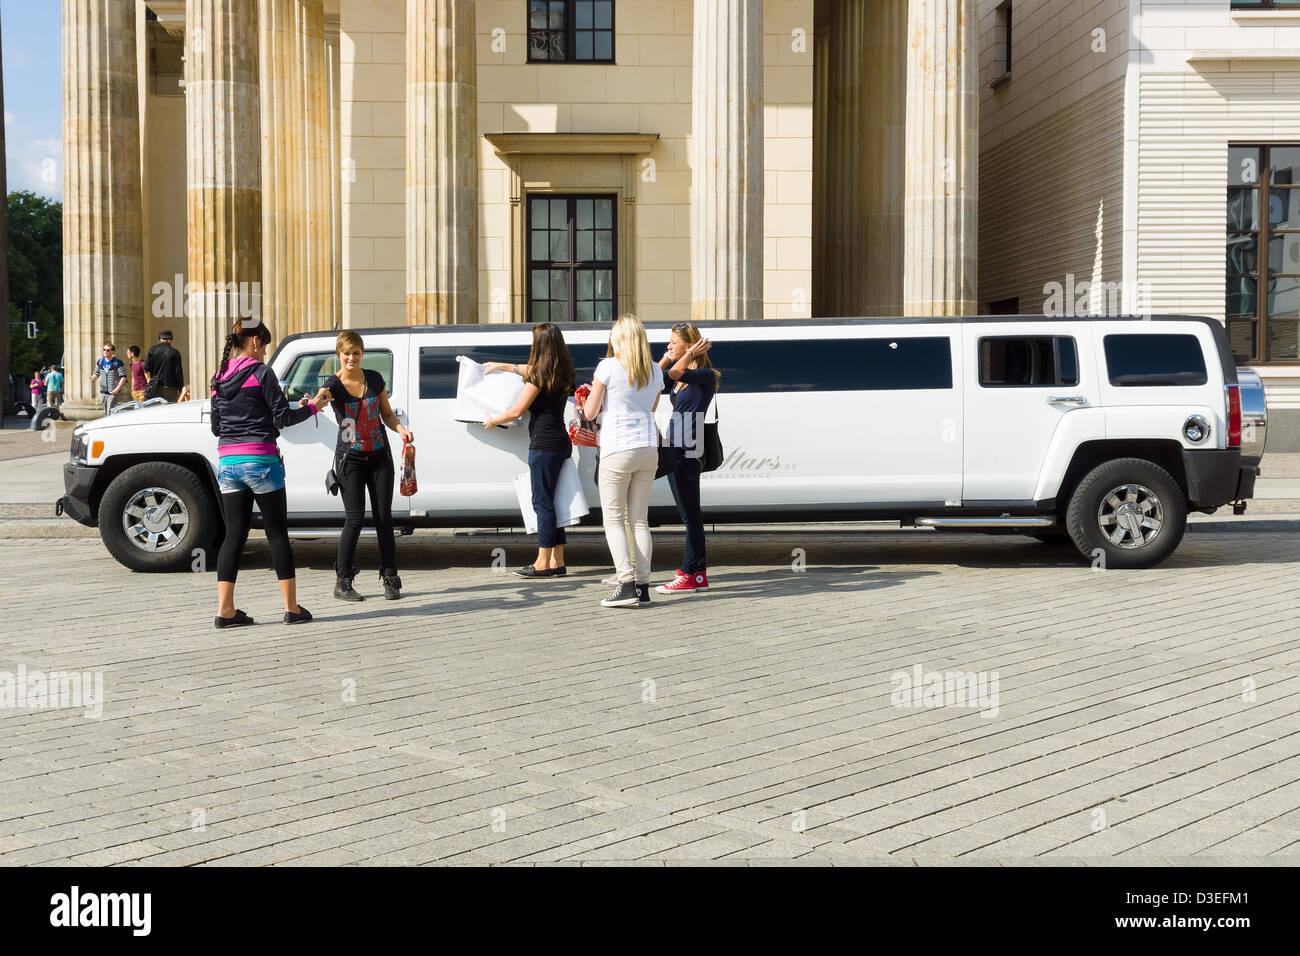 Hummer car near the Brandenburg Gate. Stock Photo